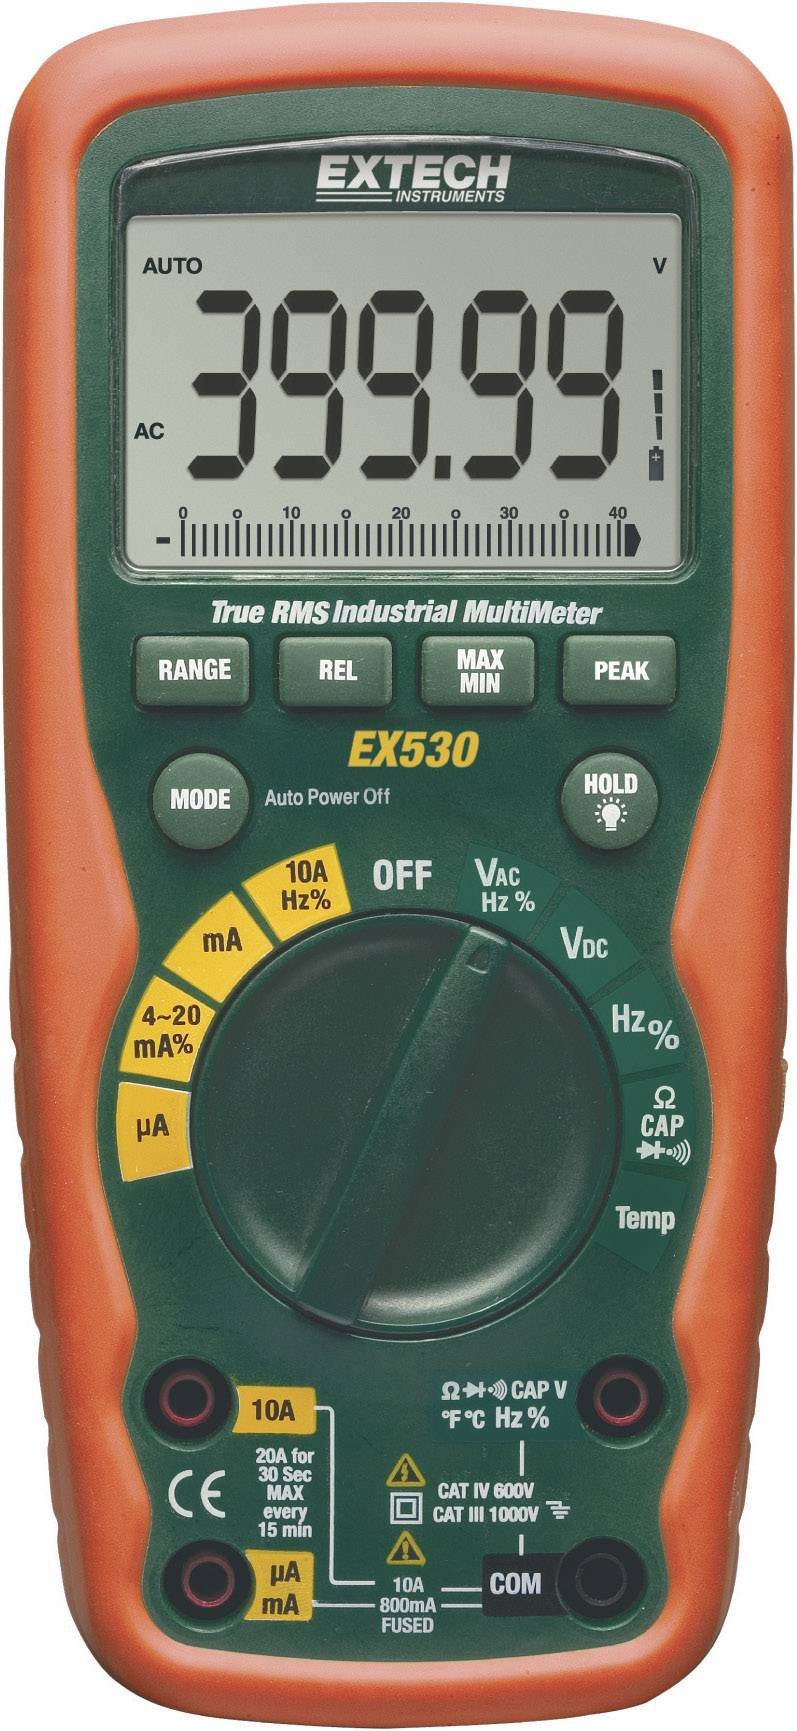 Digitálne/y ručný multimeter Extech EX530 EX530, vodotesné (IP67)